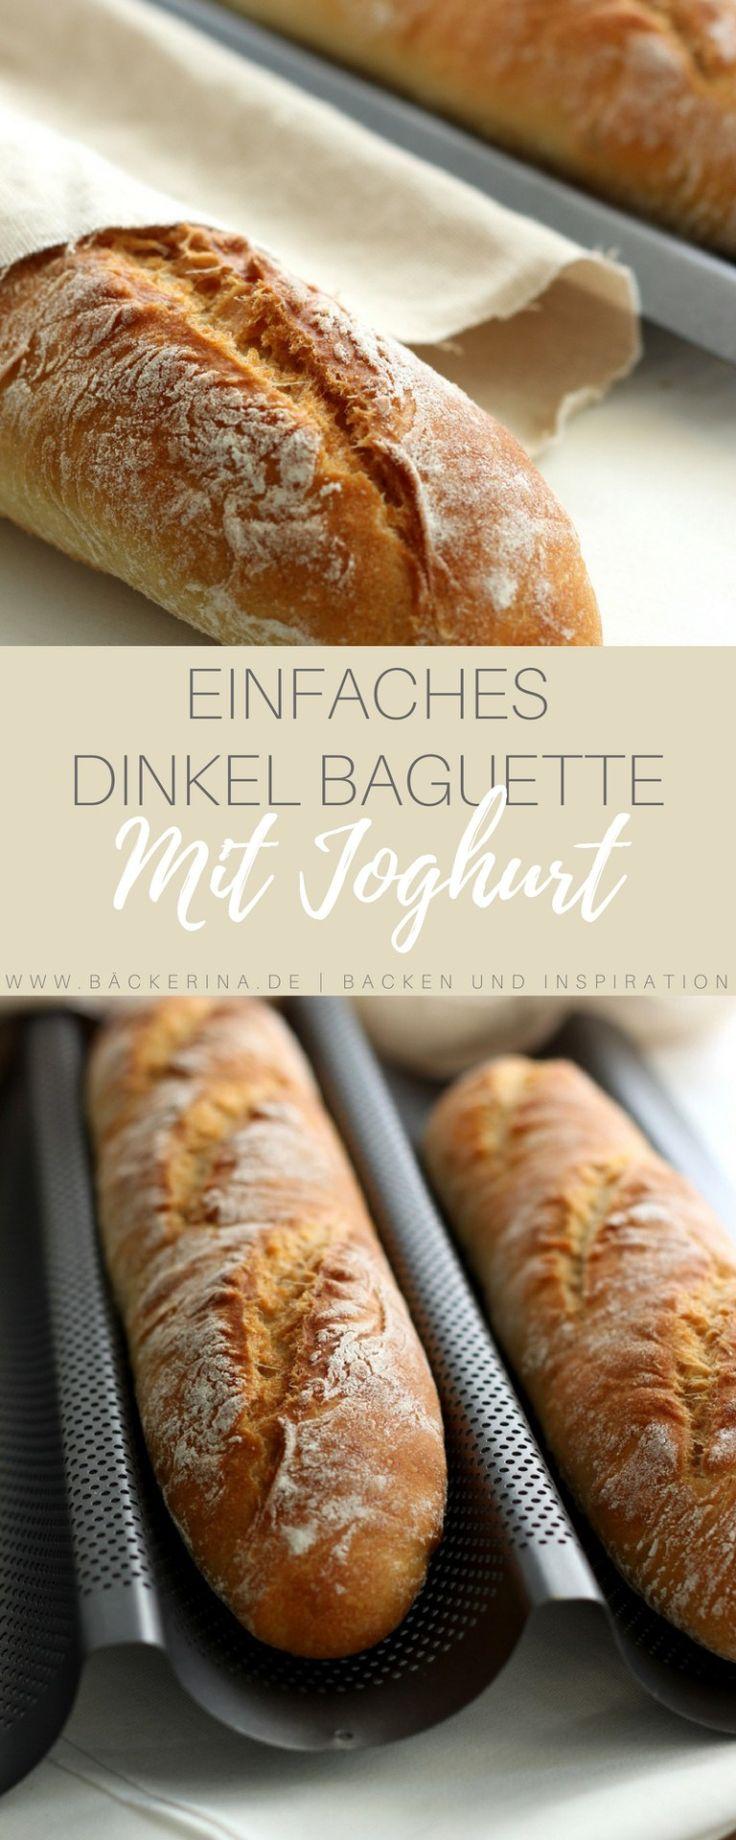 Dinkelbaguette